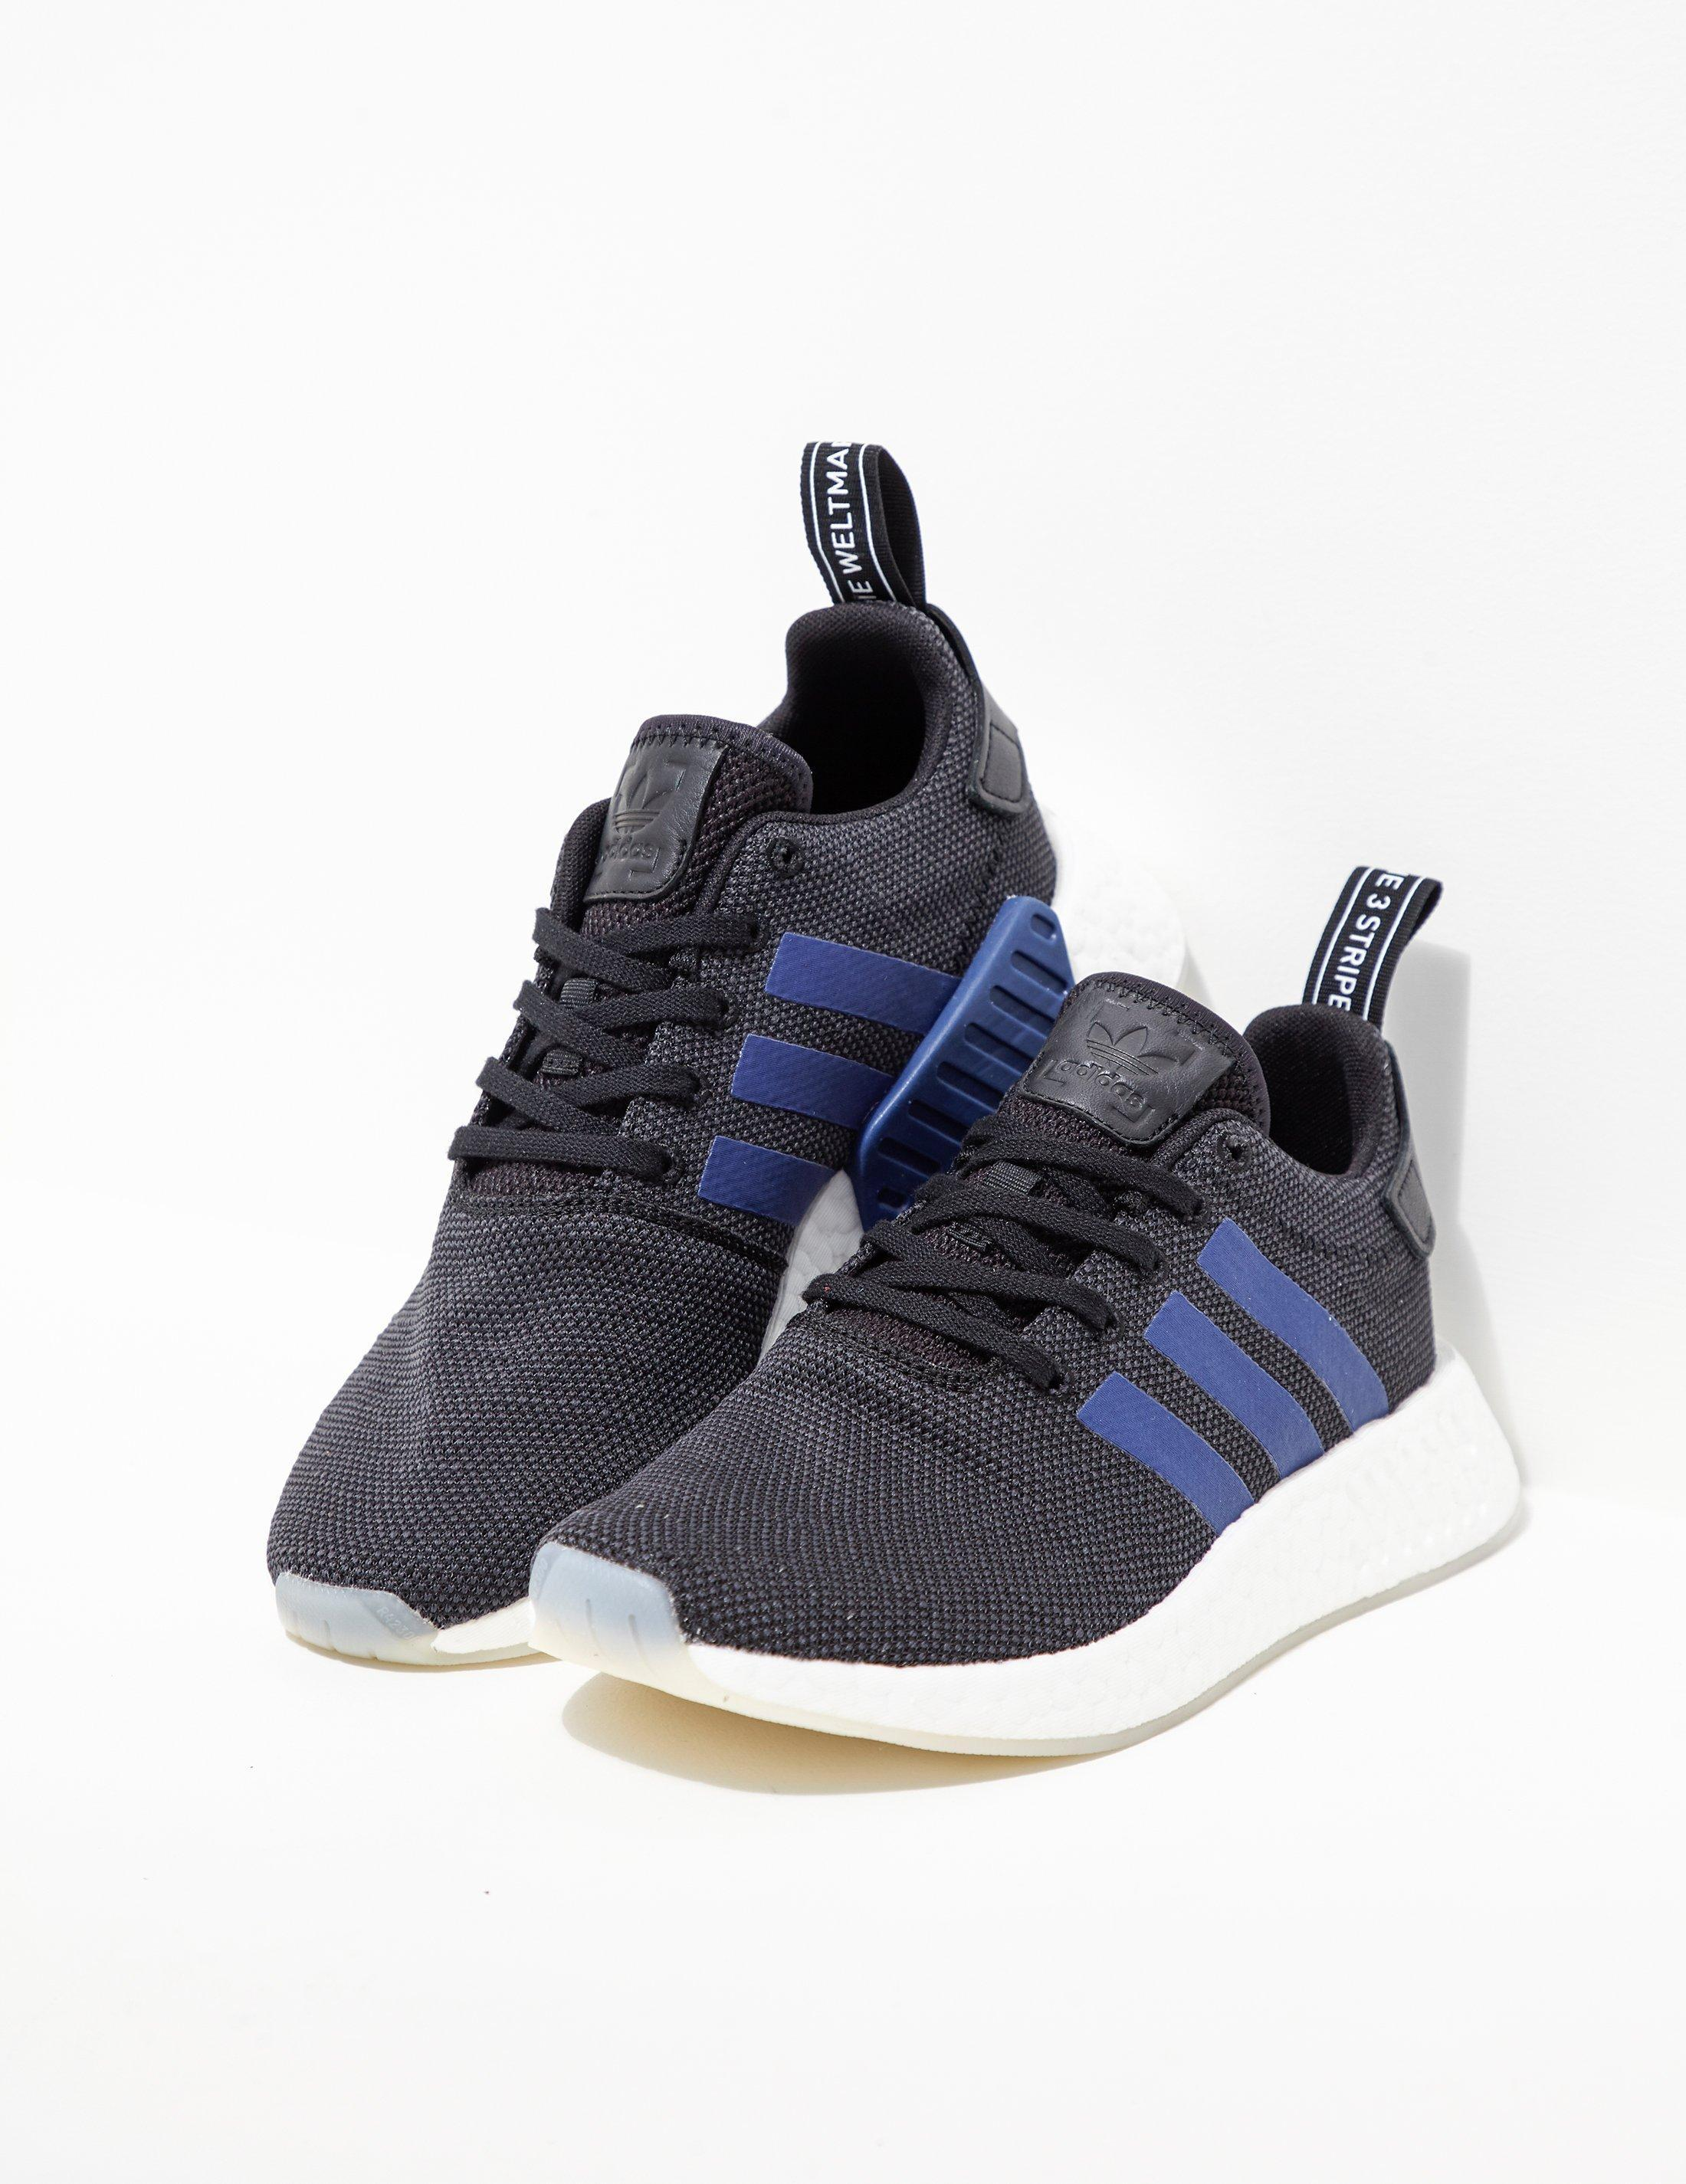 best sneakers a42f3 e44a5 Nmd R2 Women's Black